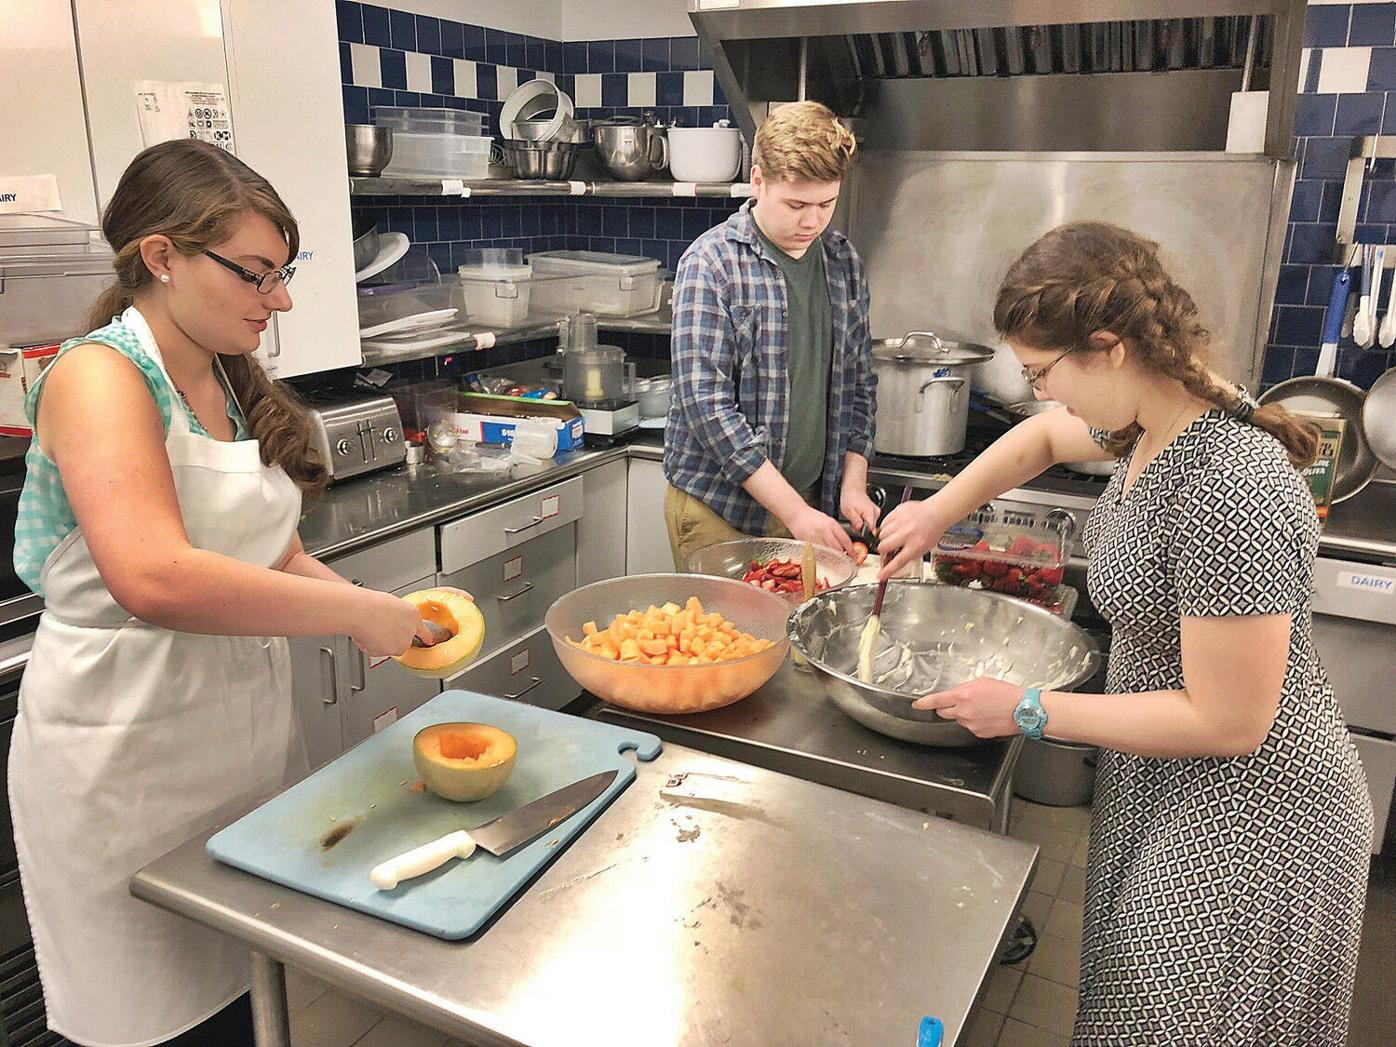 Shabbat at Williams College is a community effort